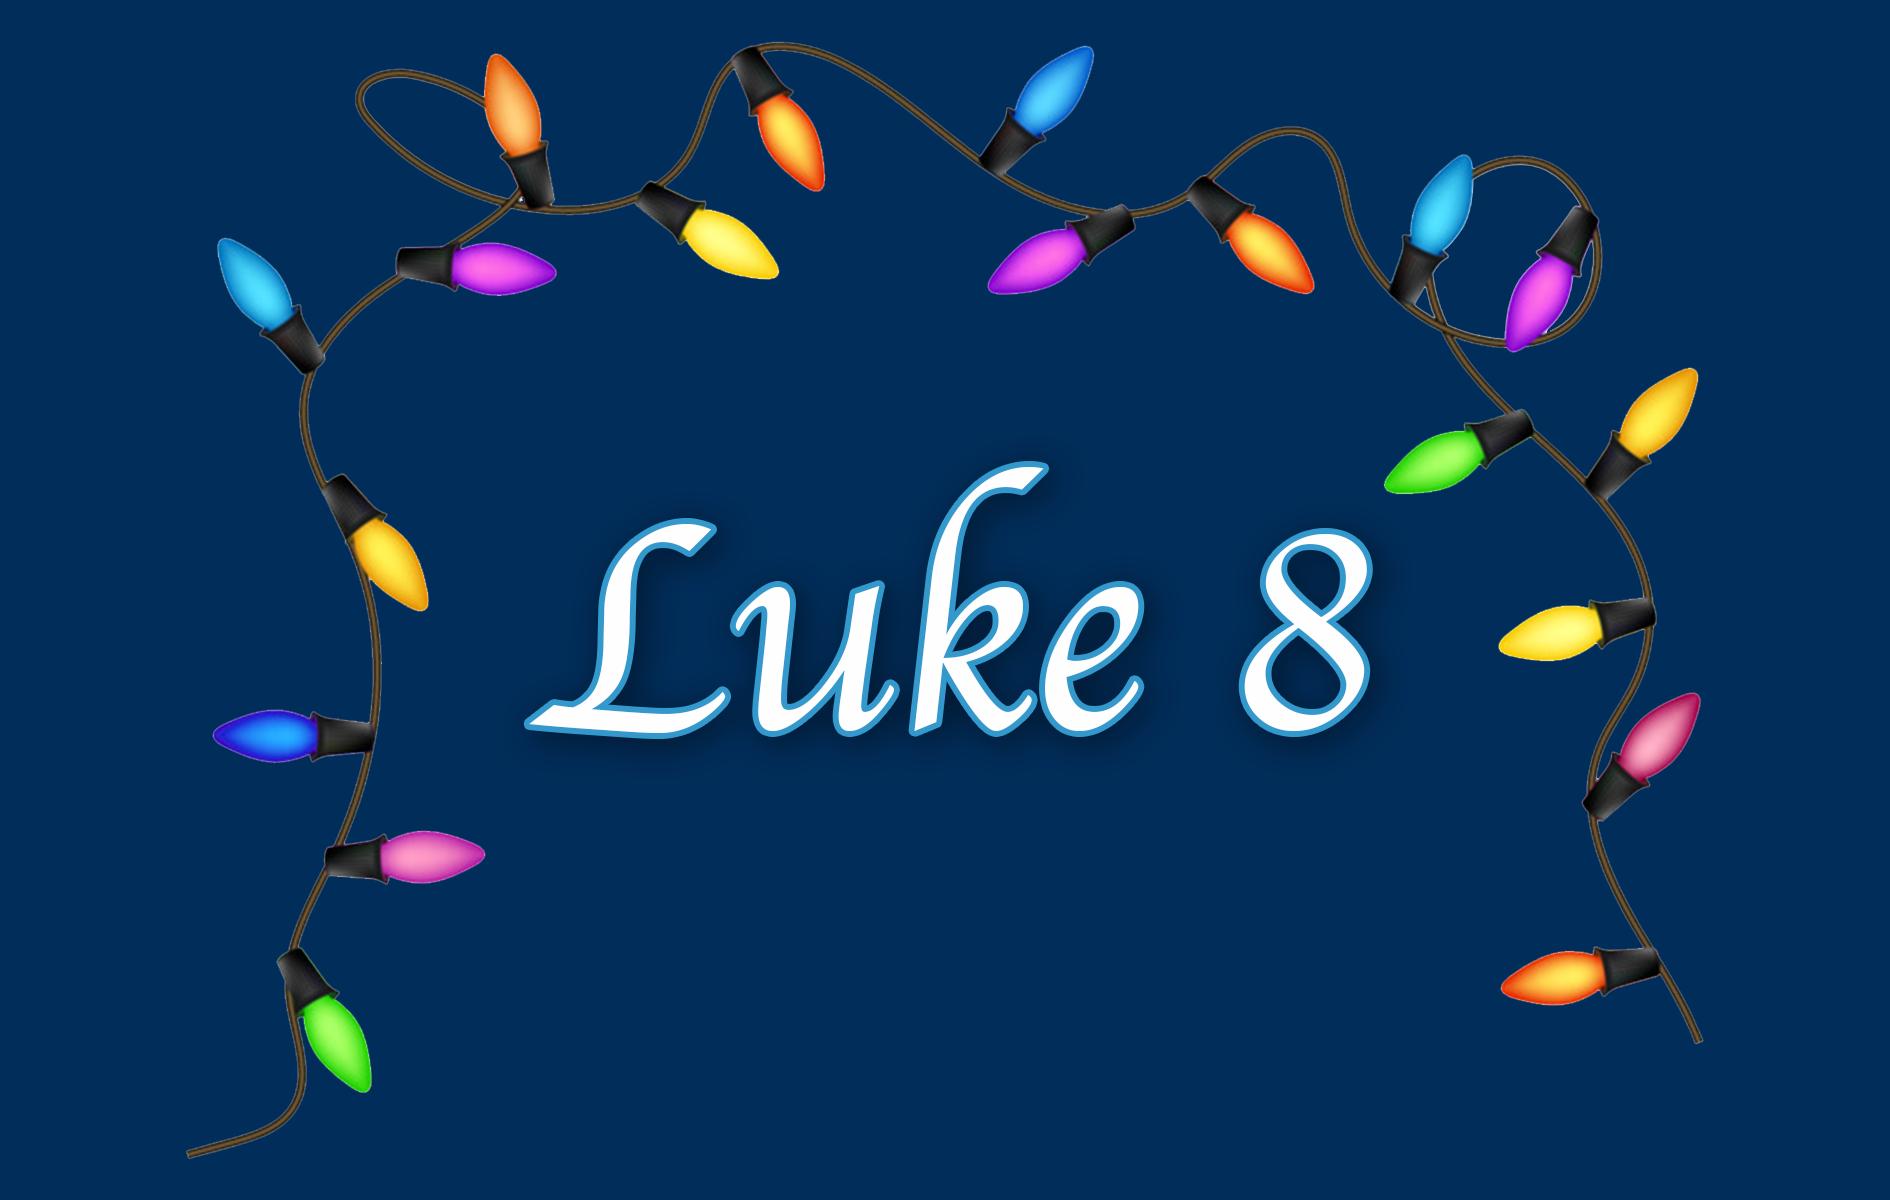 Julemysteriet – del 8